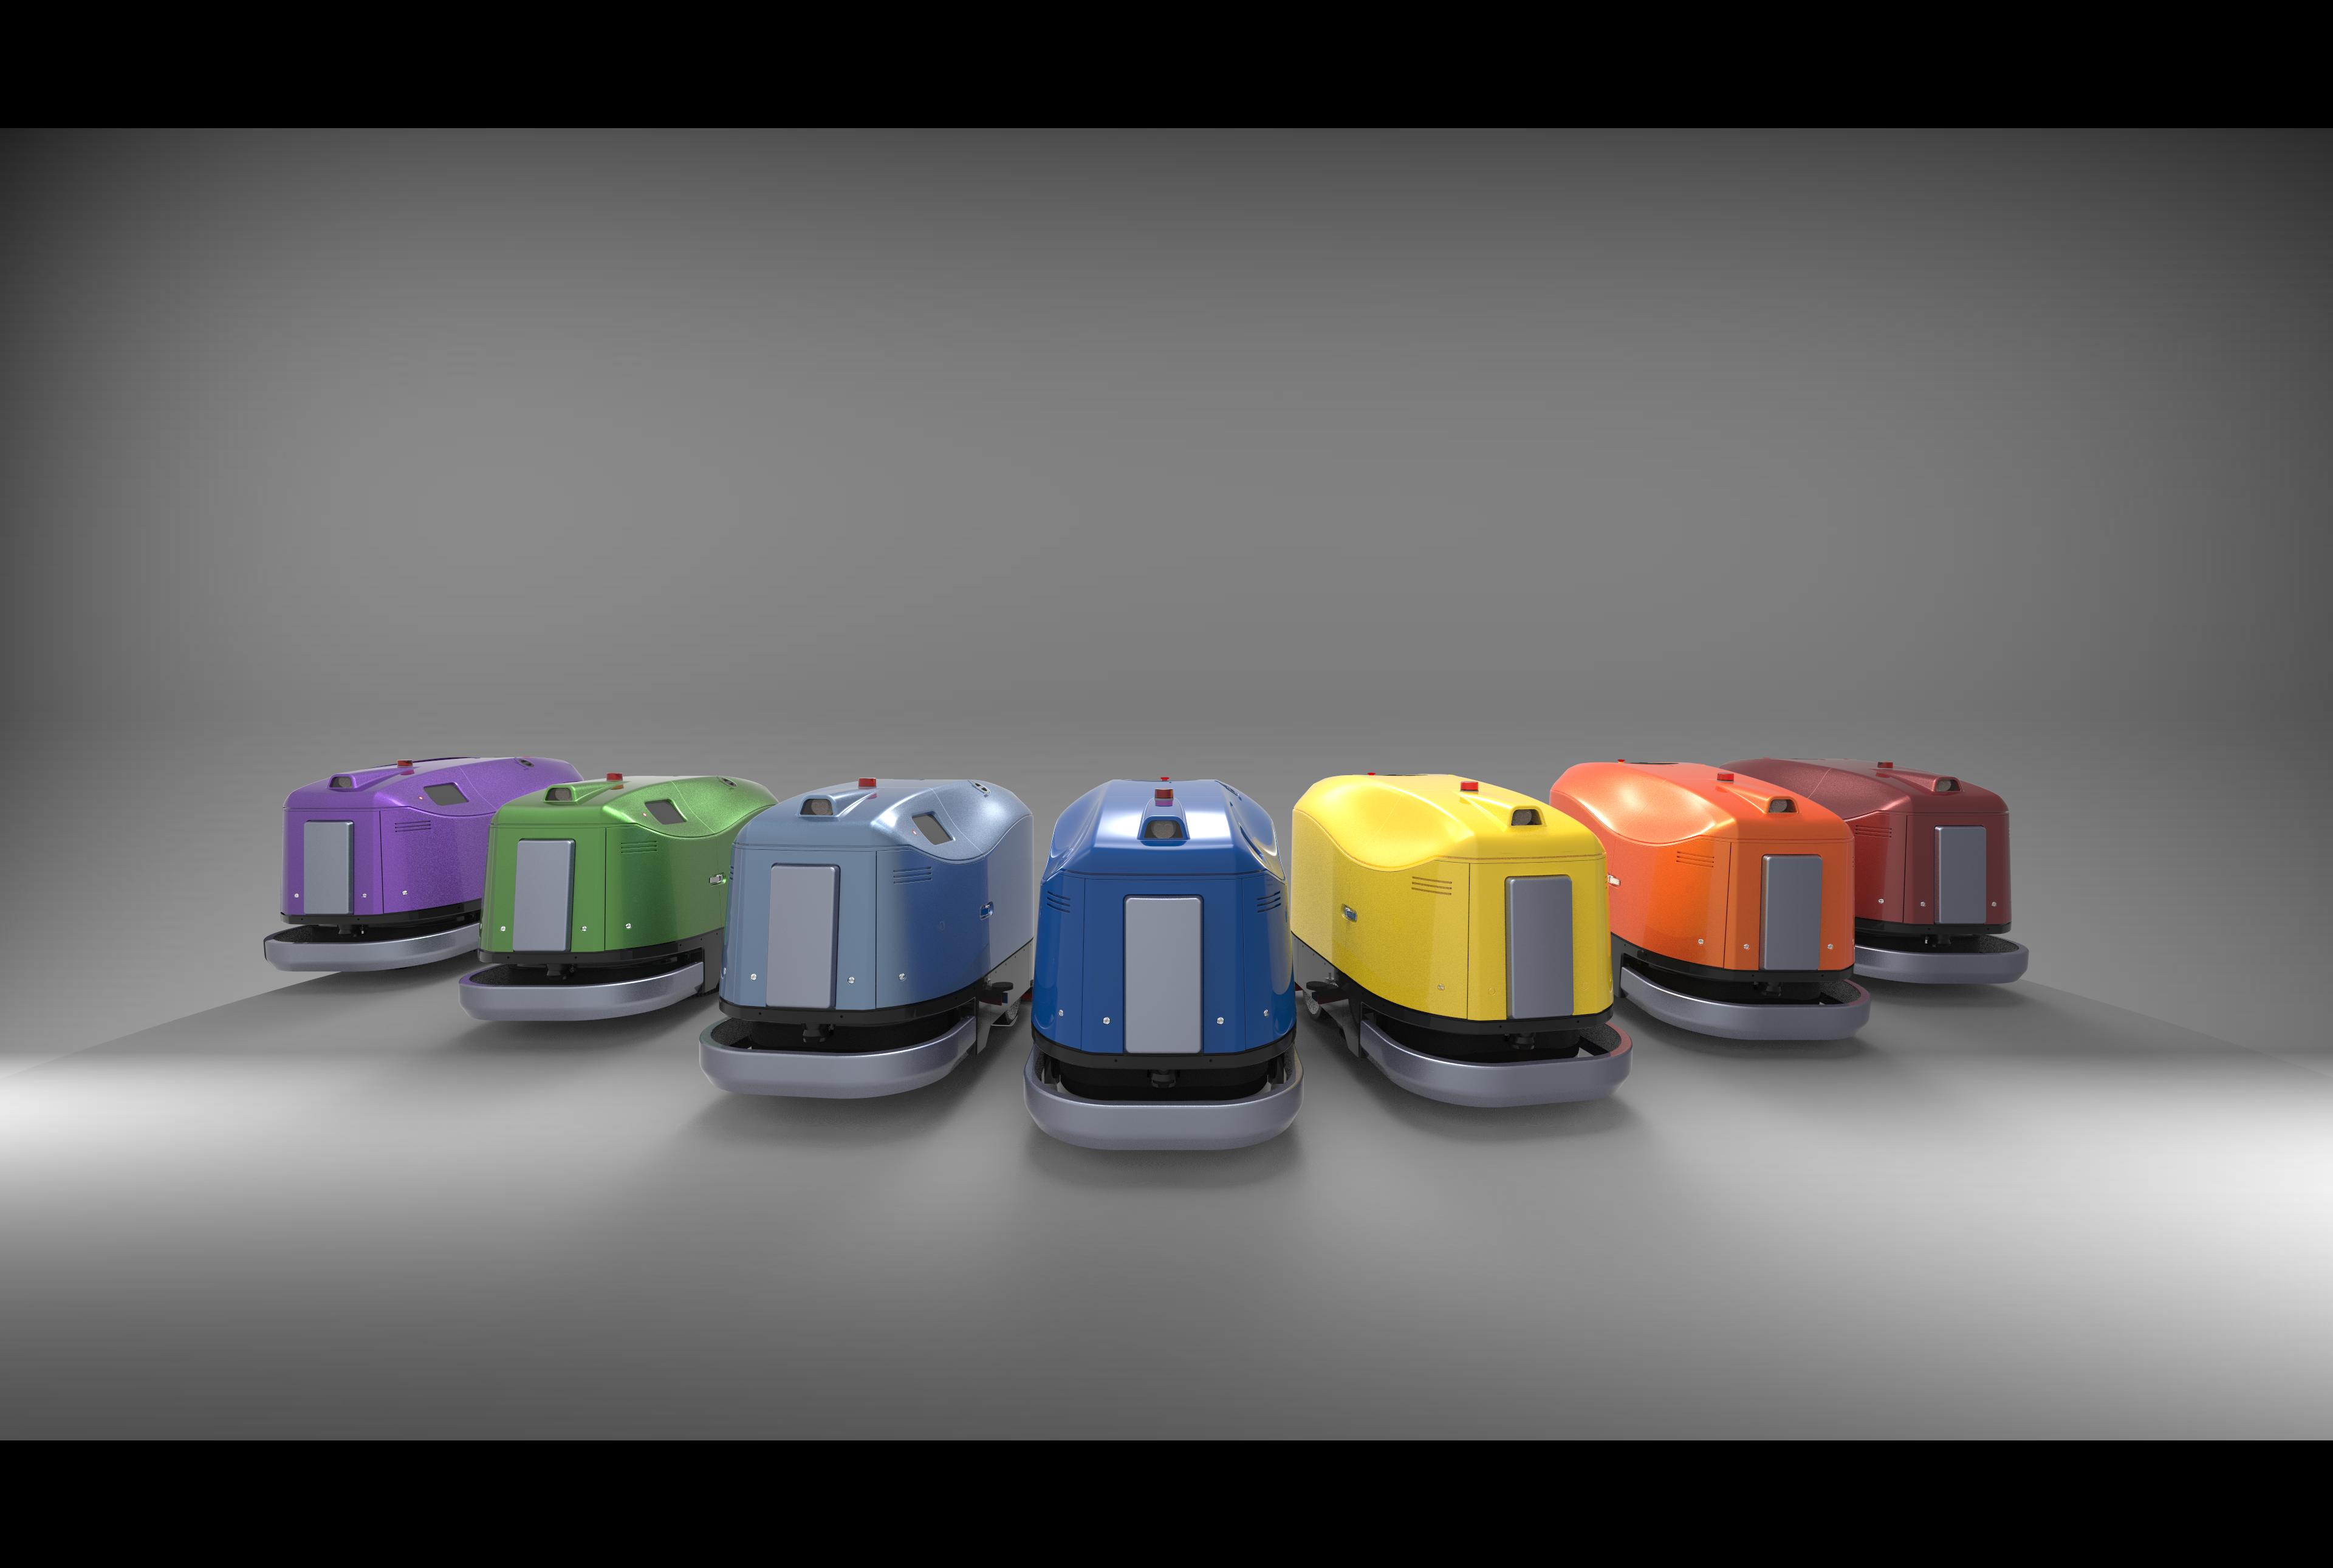 DDROBO Robotics develops and manufactures autonomous floor